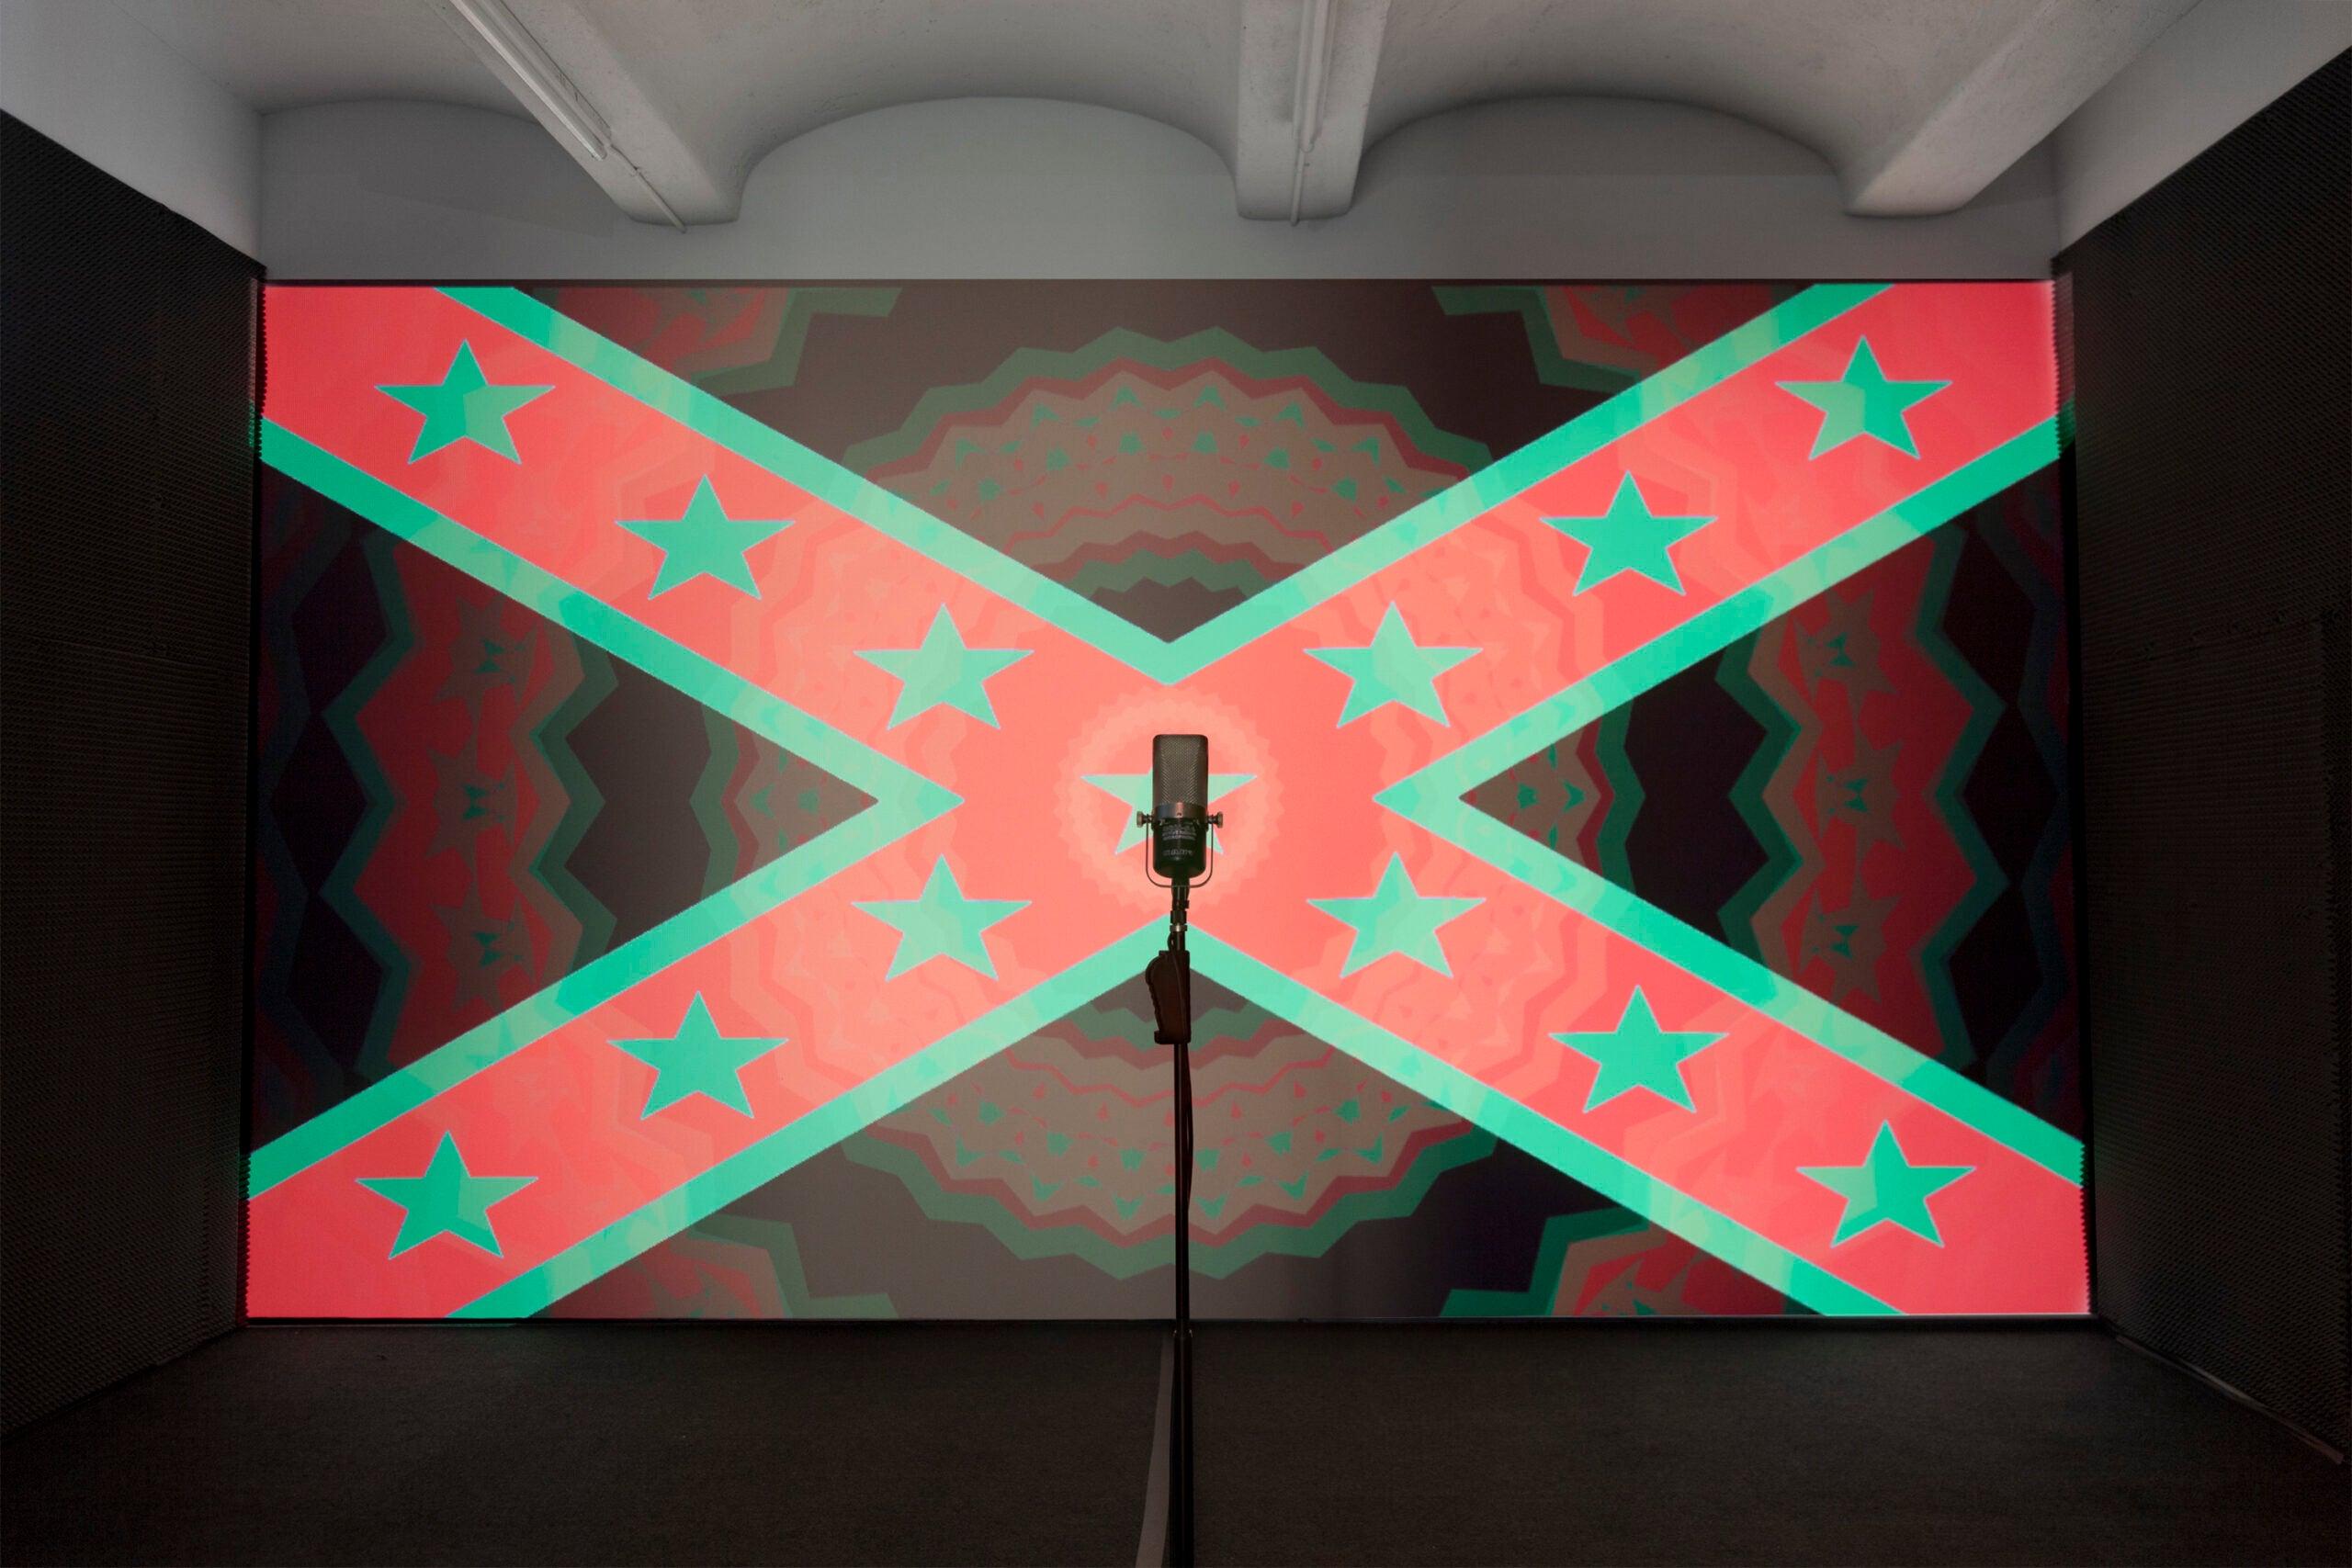 Hank Willis Thomas' Confederate Flag Exhibit and the Disruption of Oppressive Symbolism